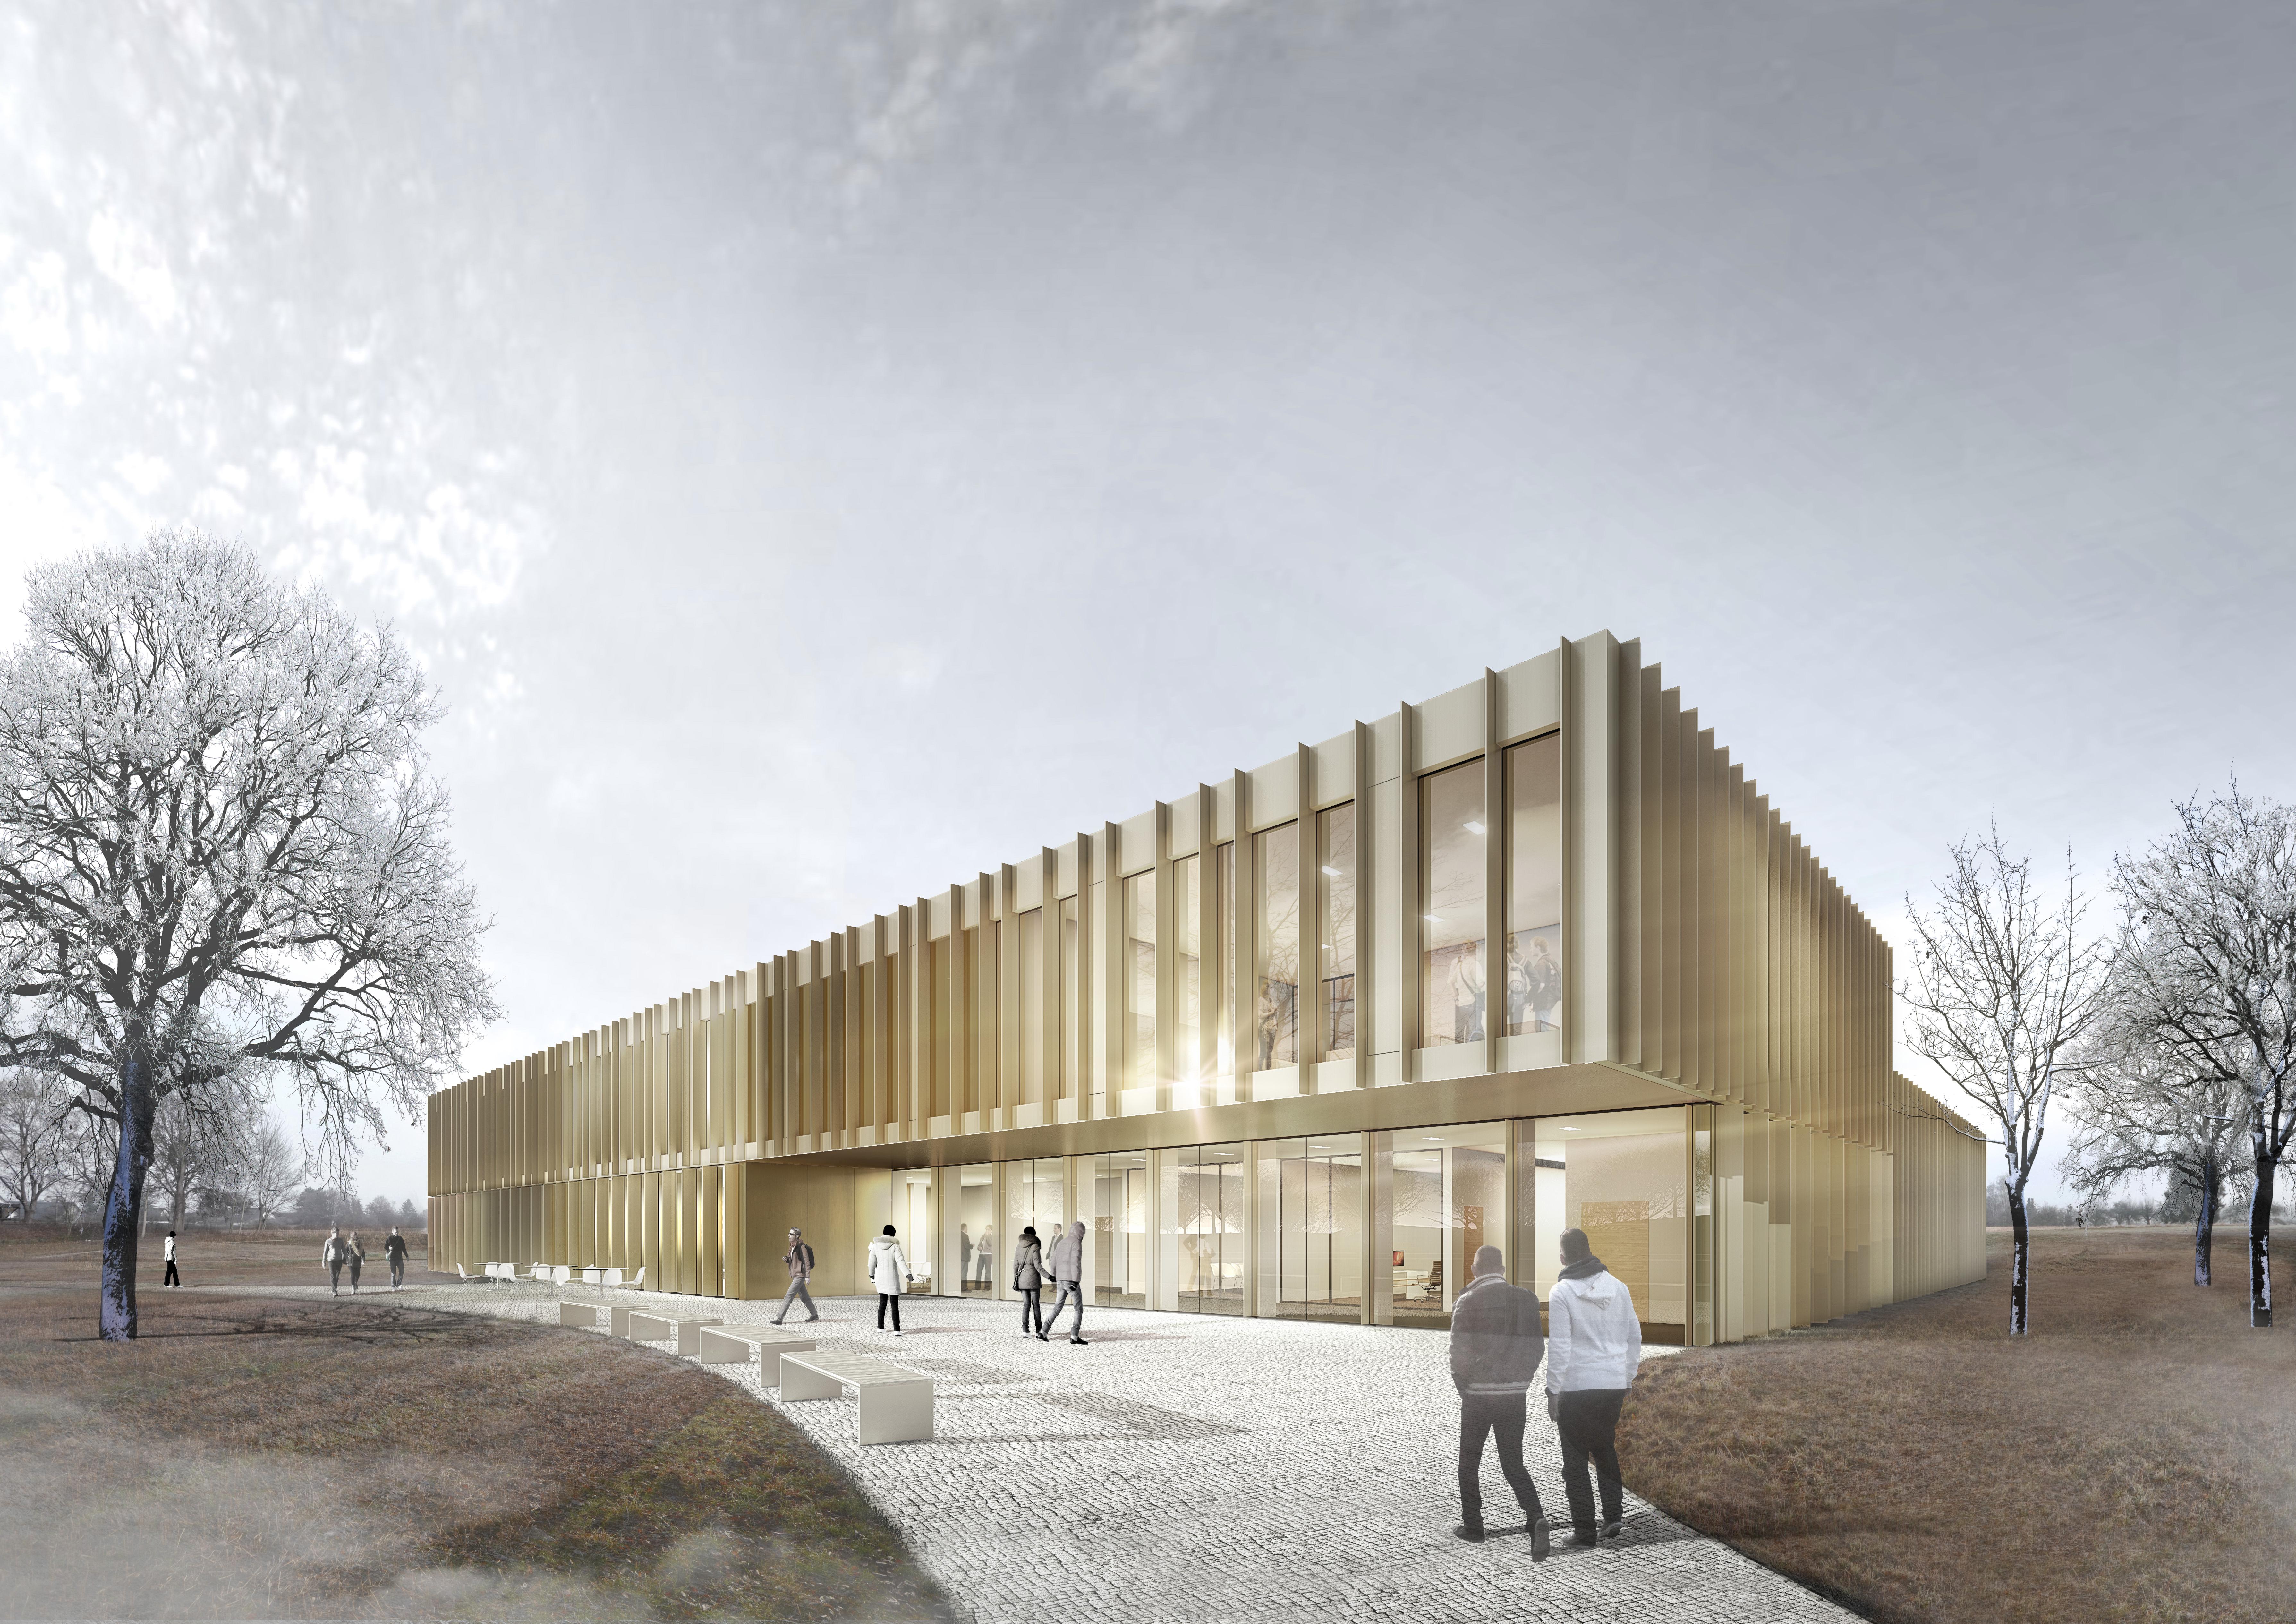 kaestle&ocker - Neubau GARP Bildungszentrum